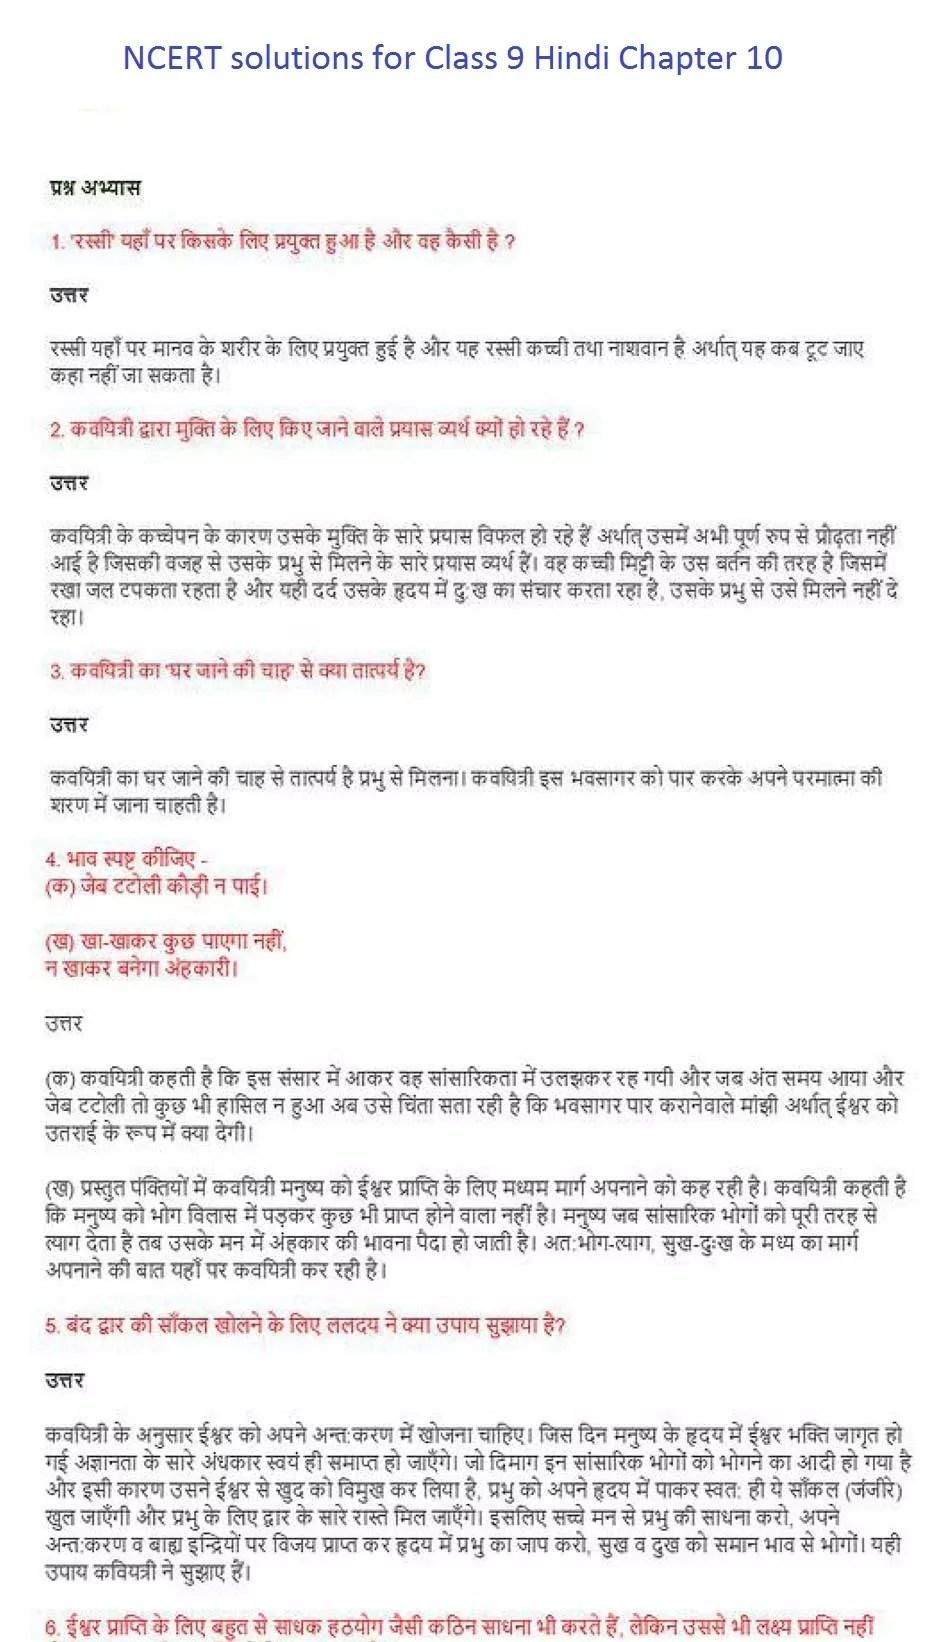 NCERT Solutions Class 9 Hindi Kshitij Chapter 10 - वाख